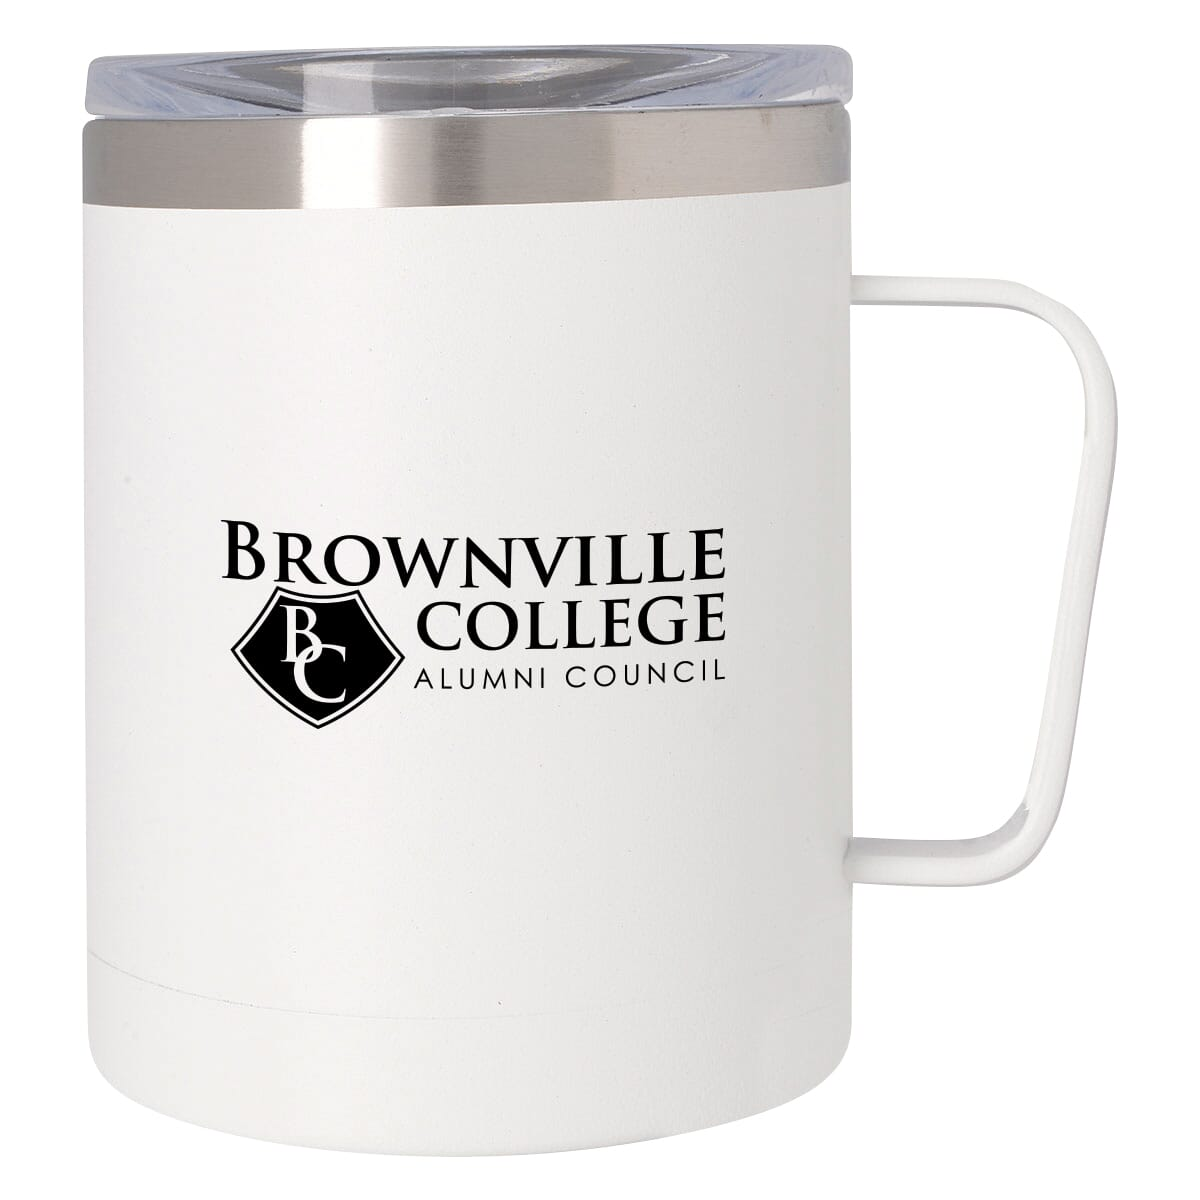 Travel coffe mug with lid, handle, and logo